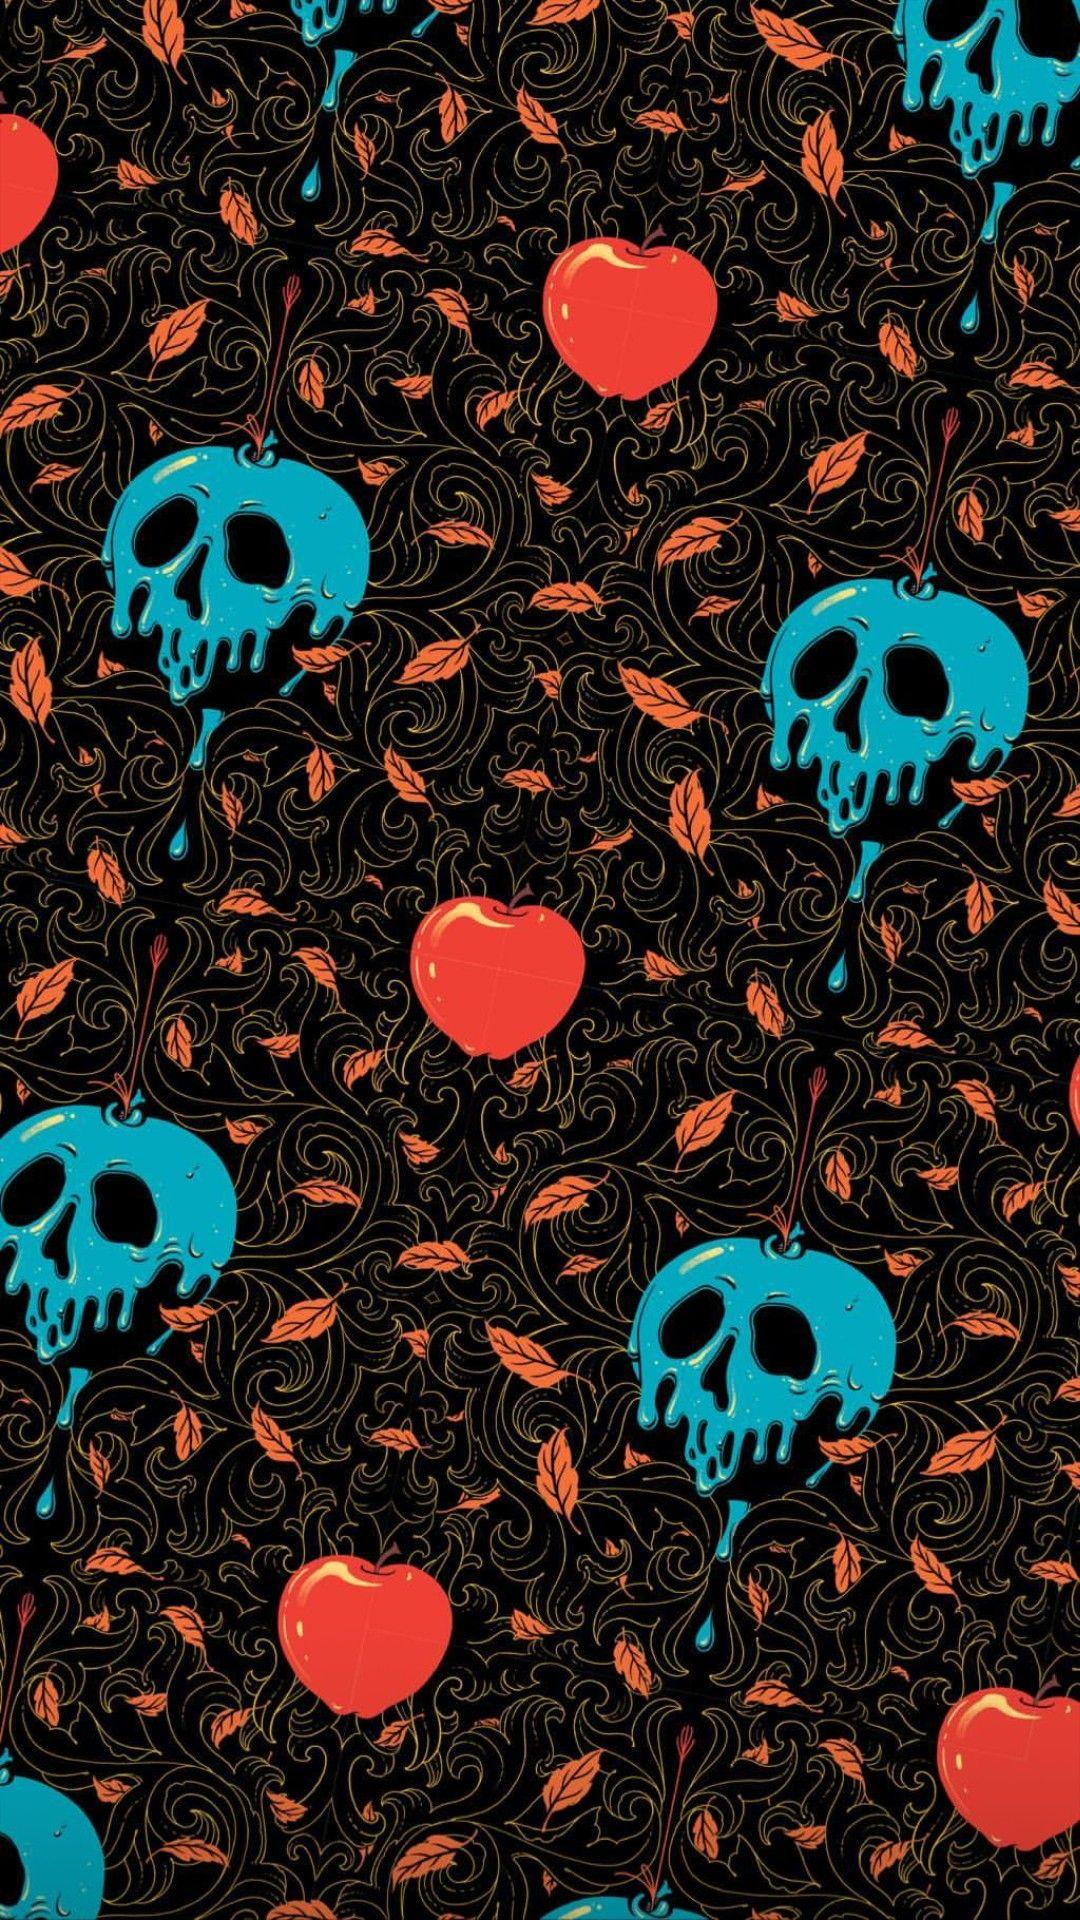 Pin By Elizabeth Pfeffer On Disney Villains In 2020 Halloween Wallpaper Iphone Disney Wallpaper Halloween Wallpaper